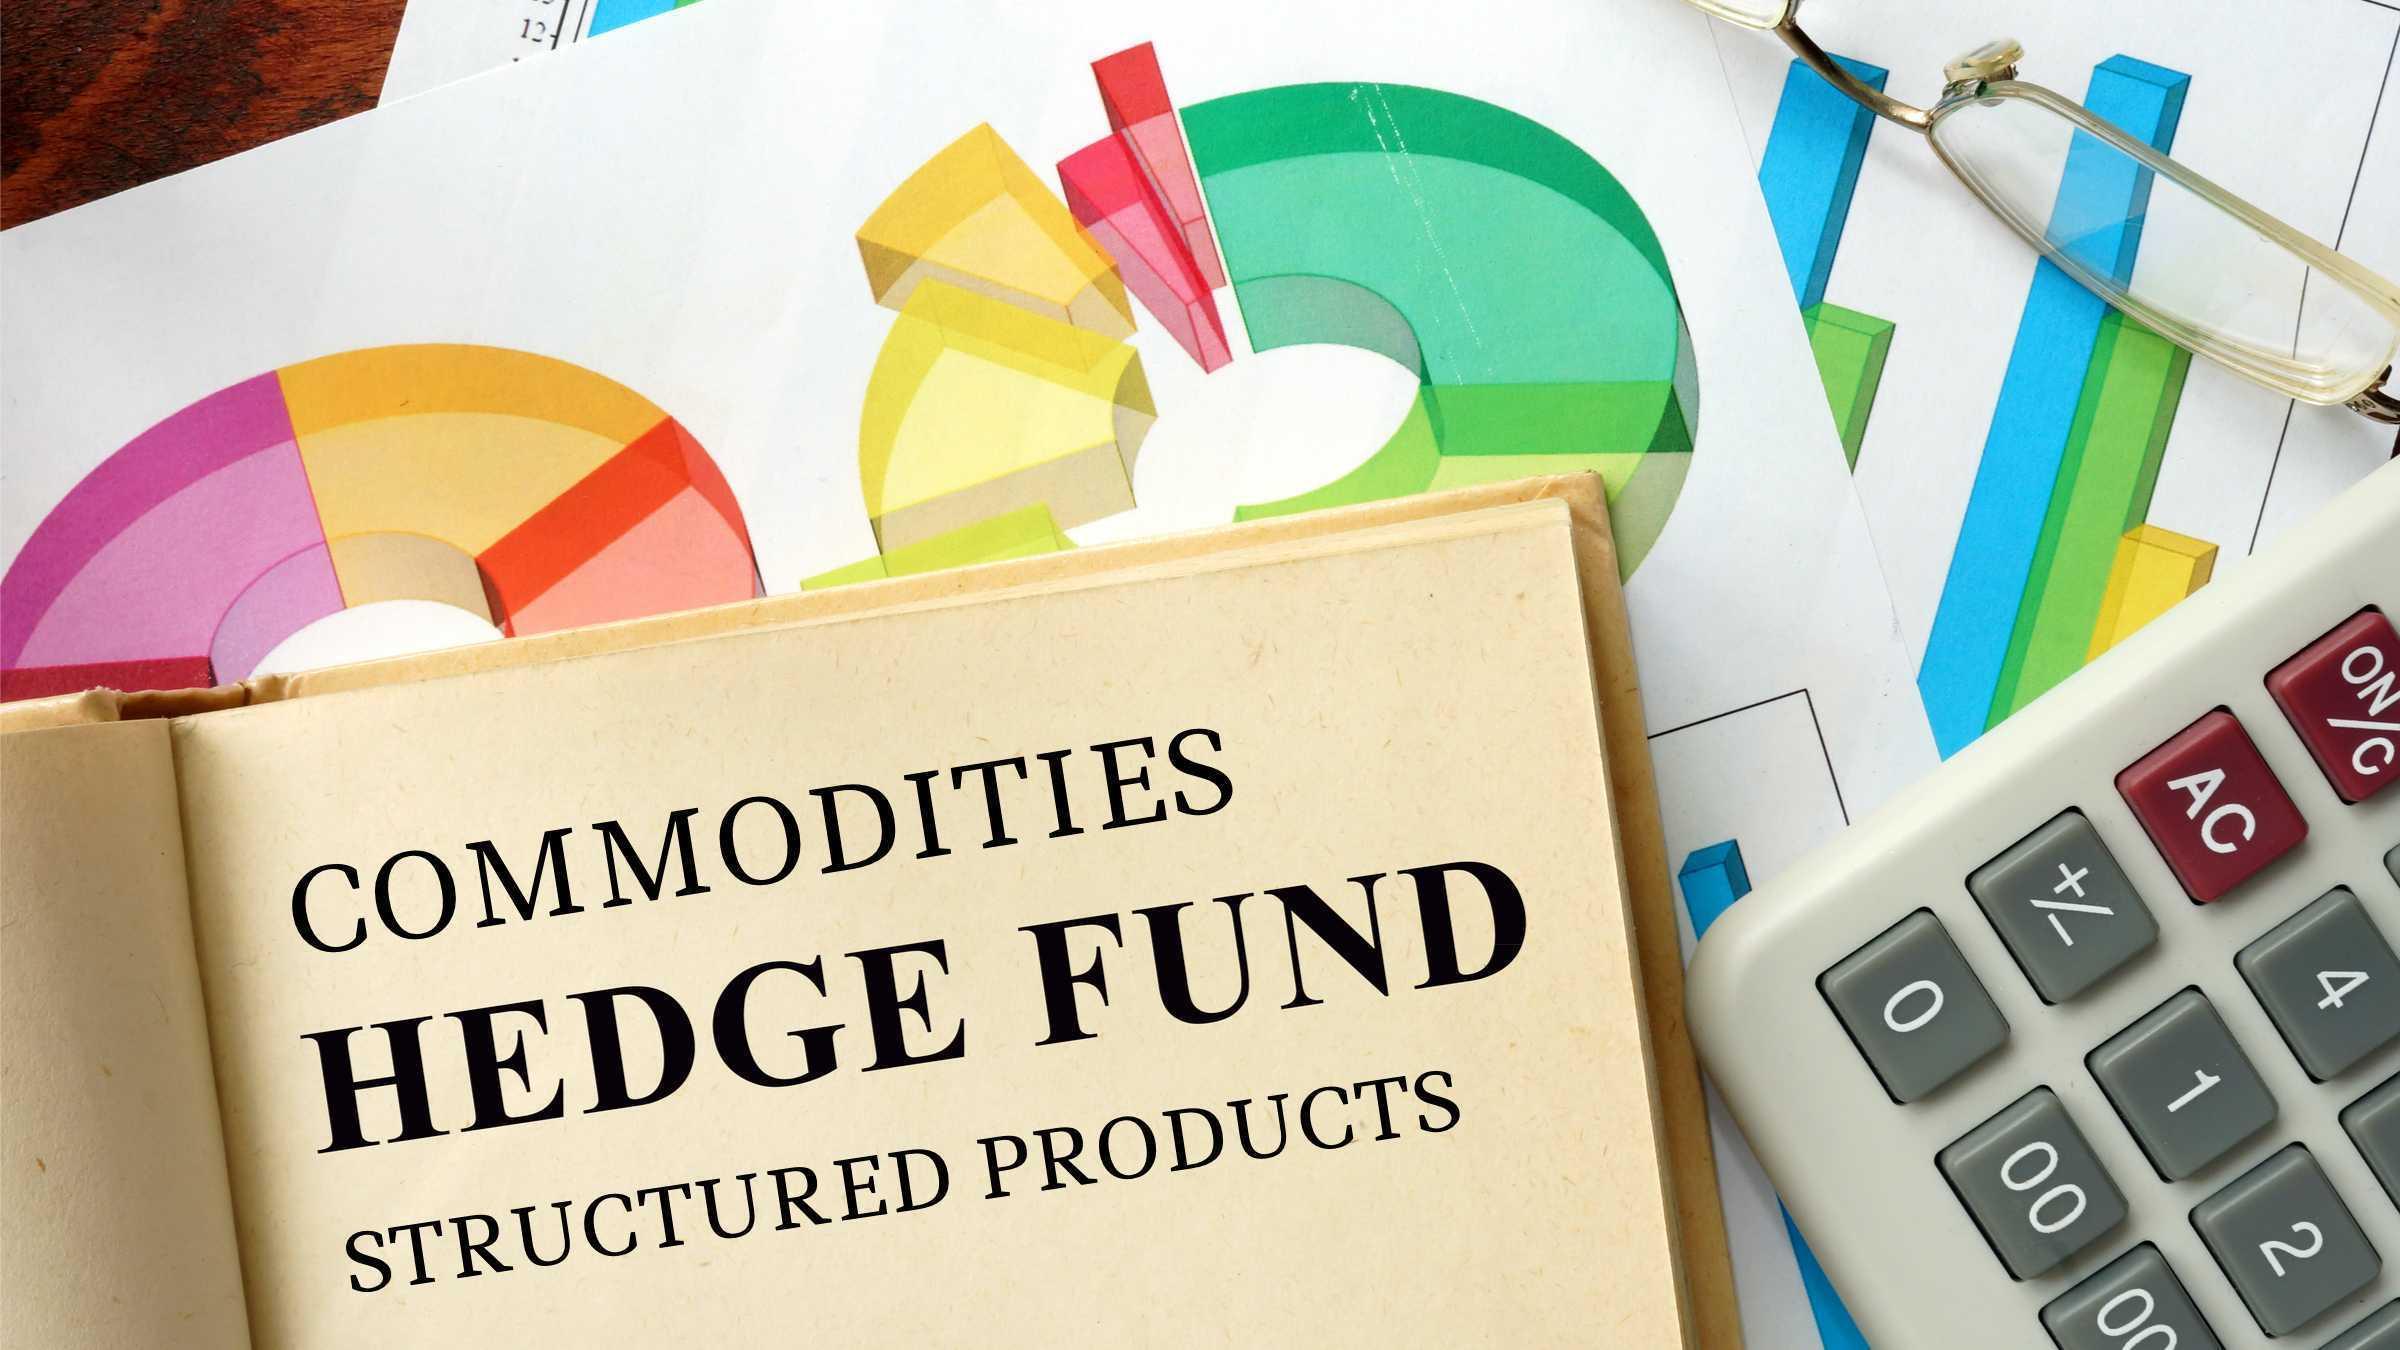 Liquide alternative Geldanlagen